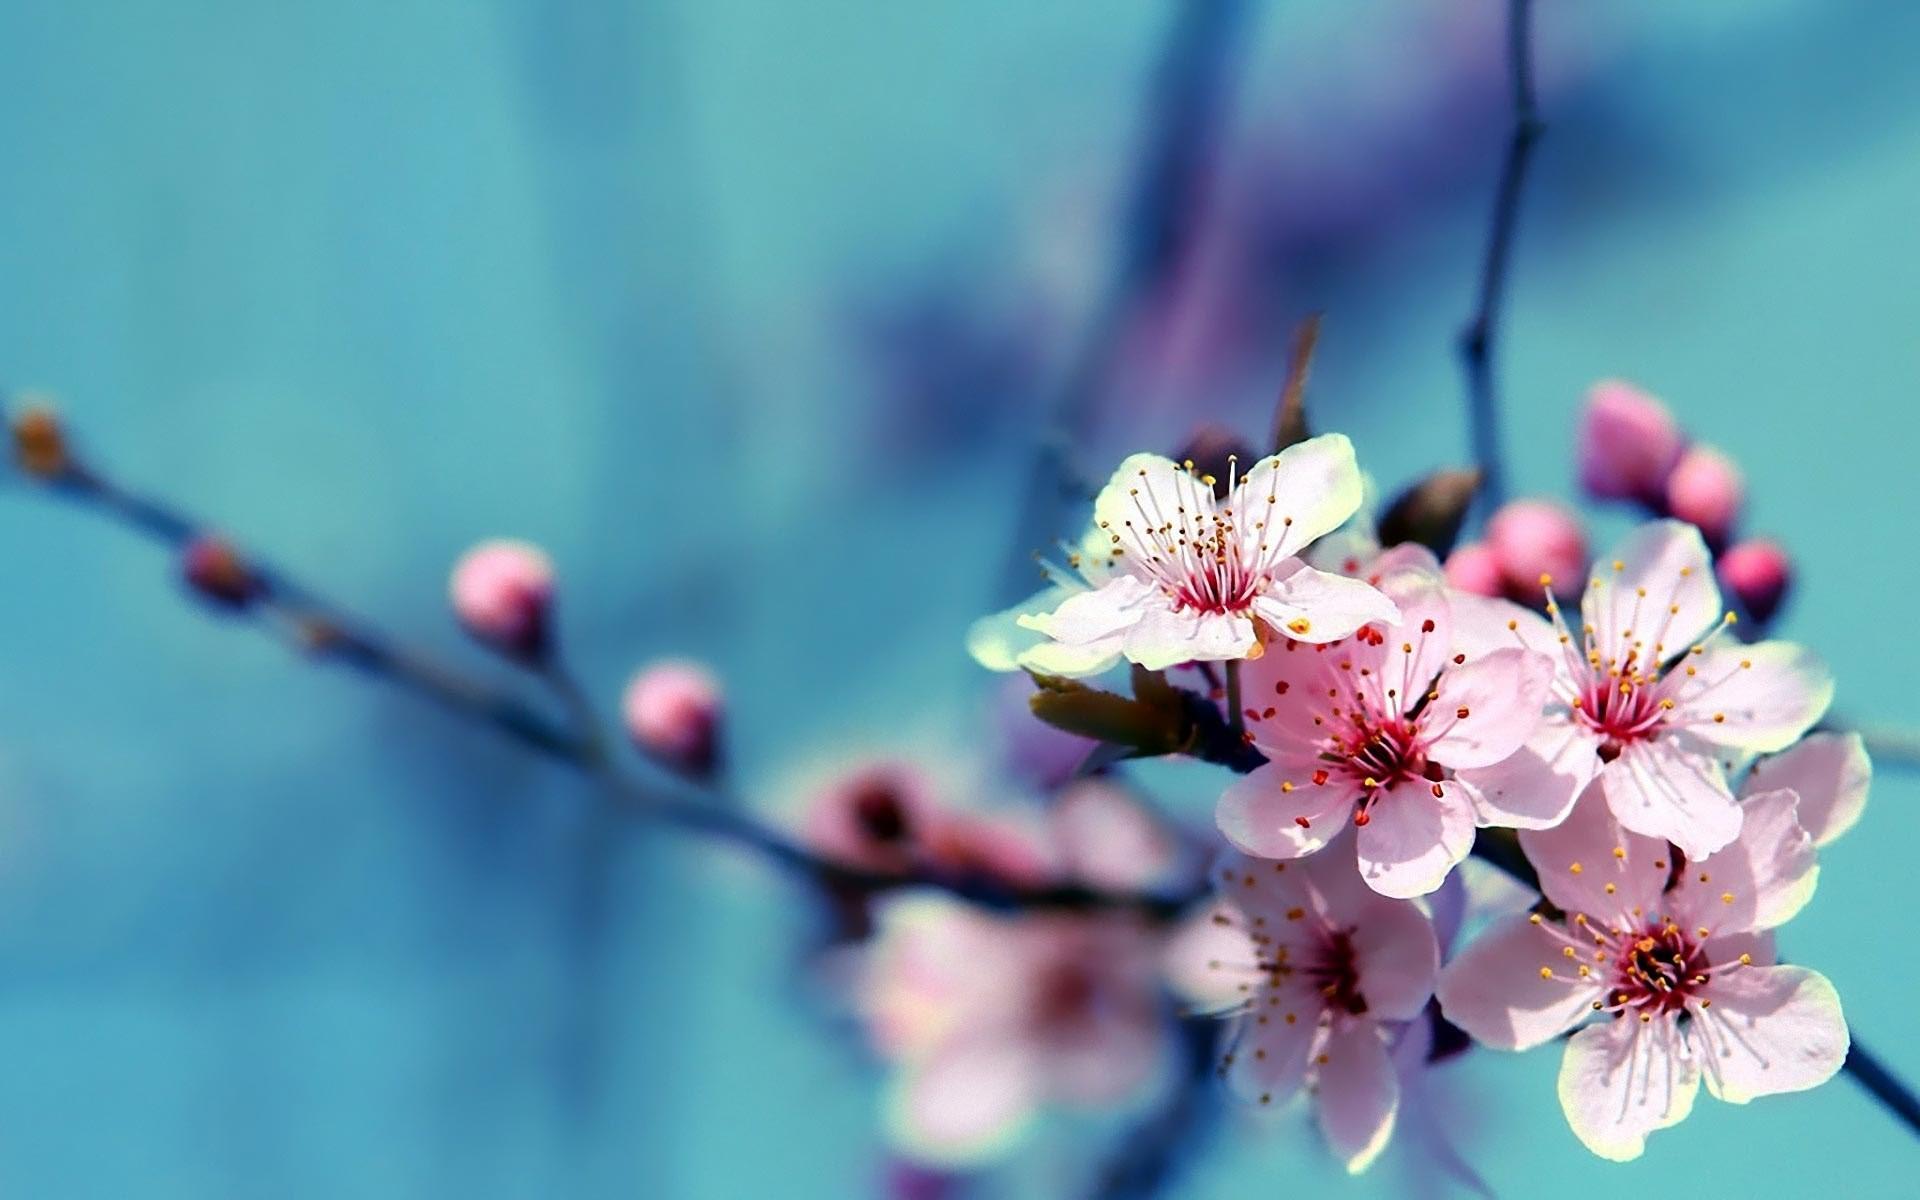 … HD-Beautiful-Flowers-Wallpapers-1 …